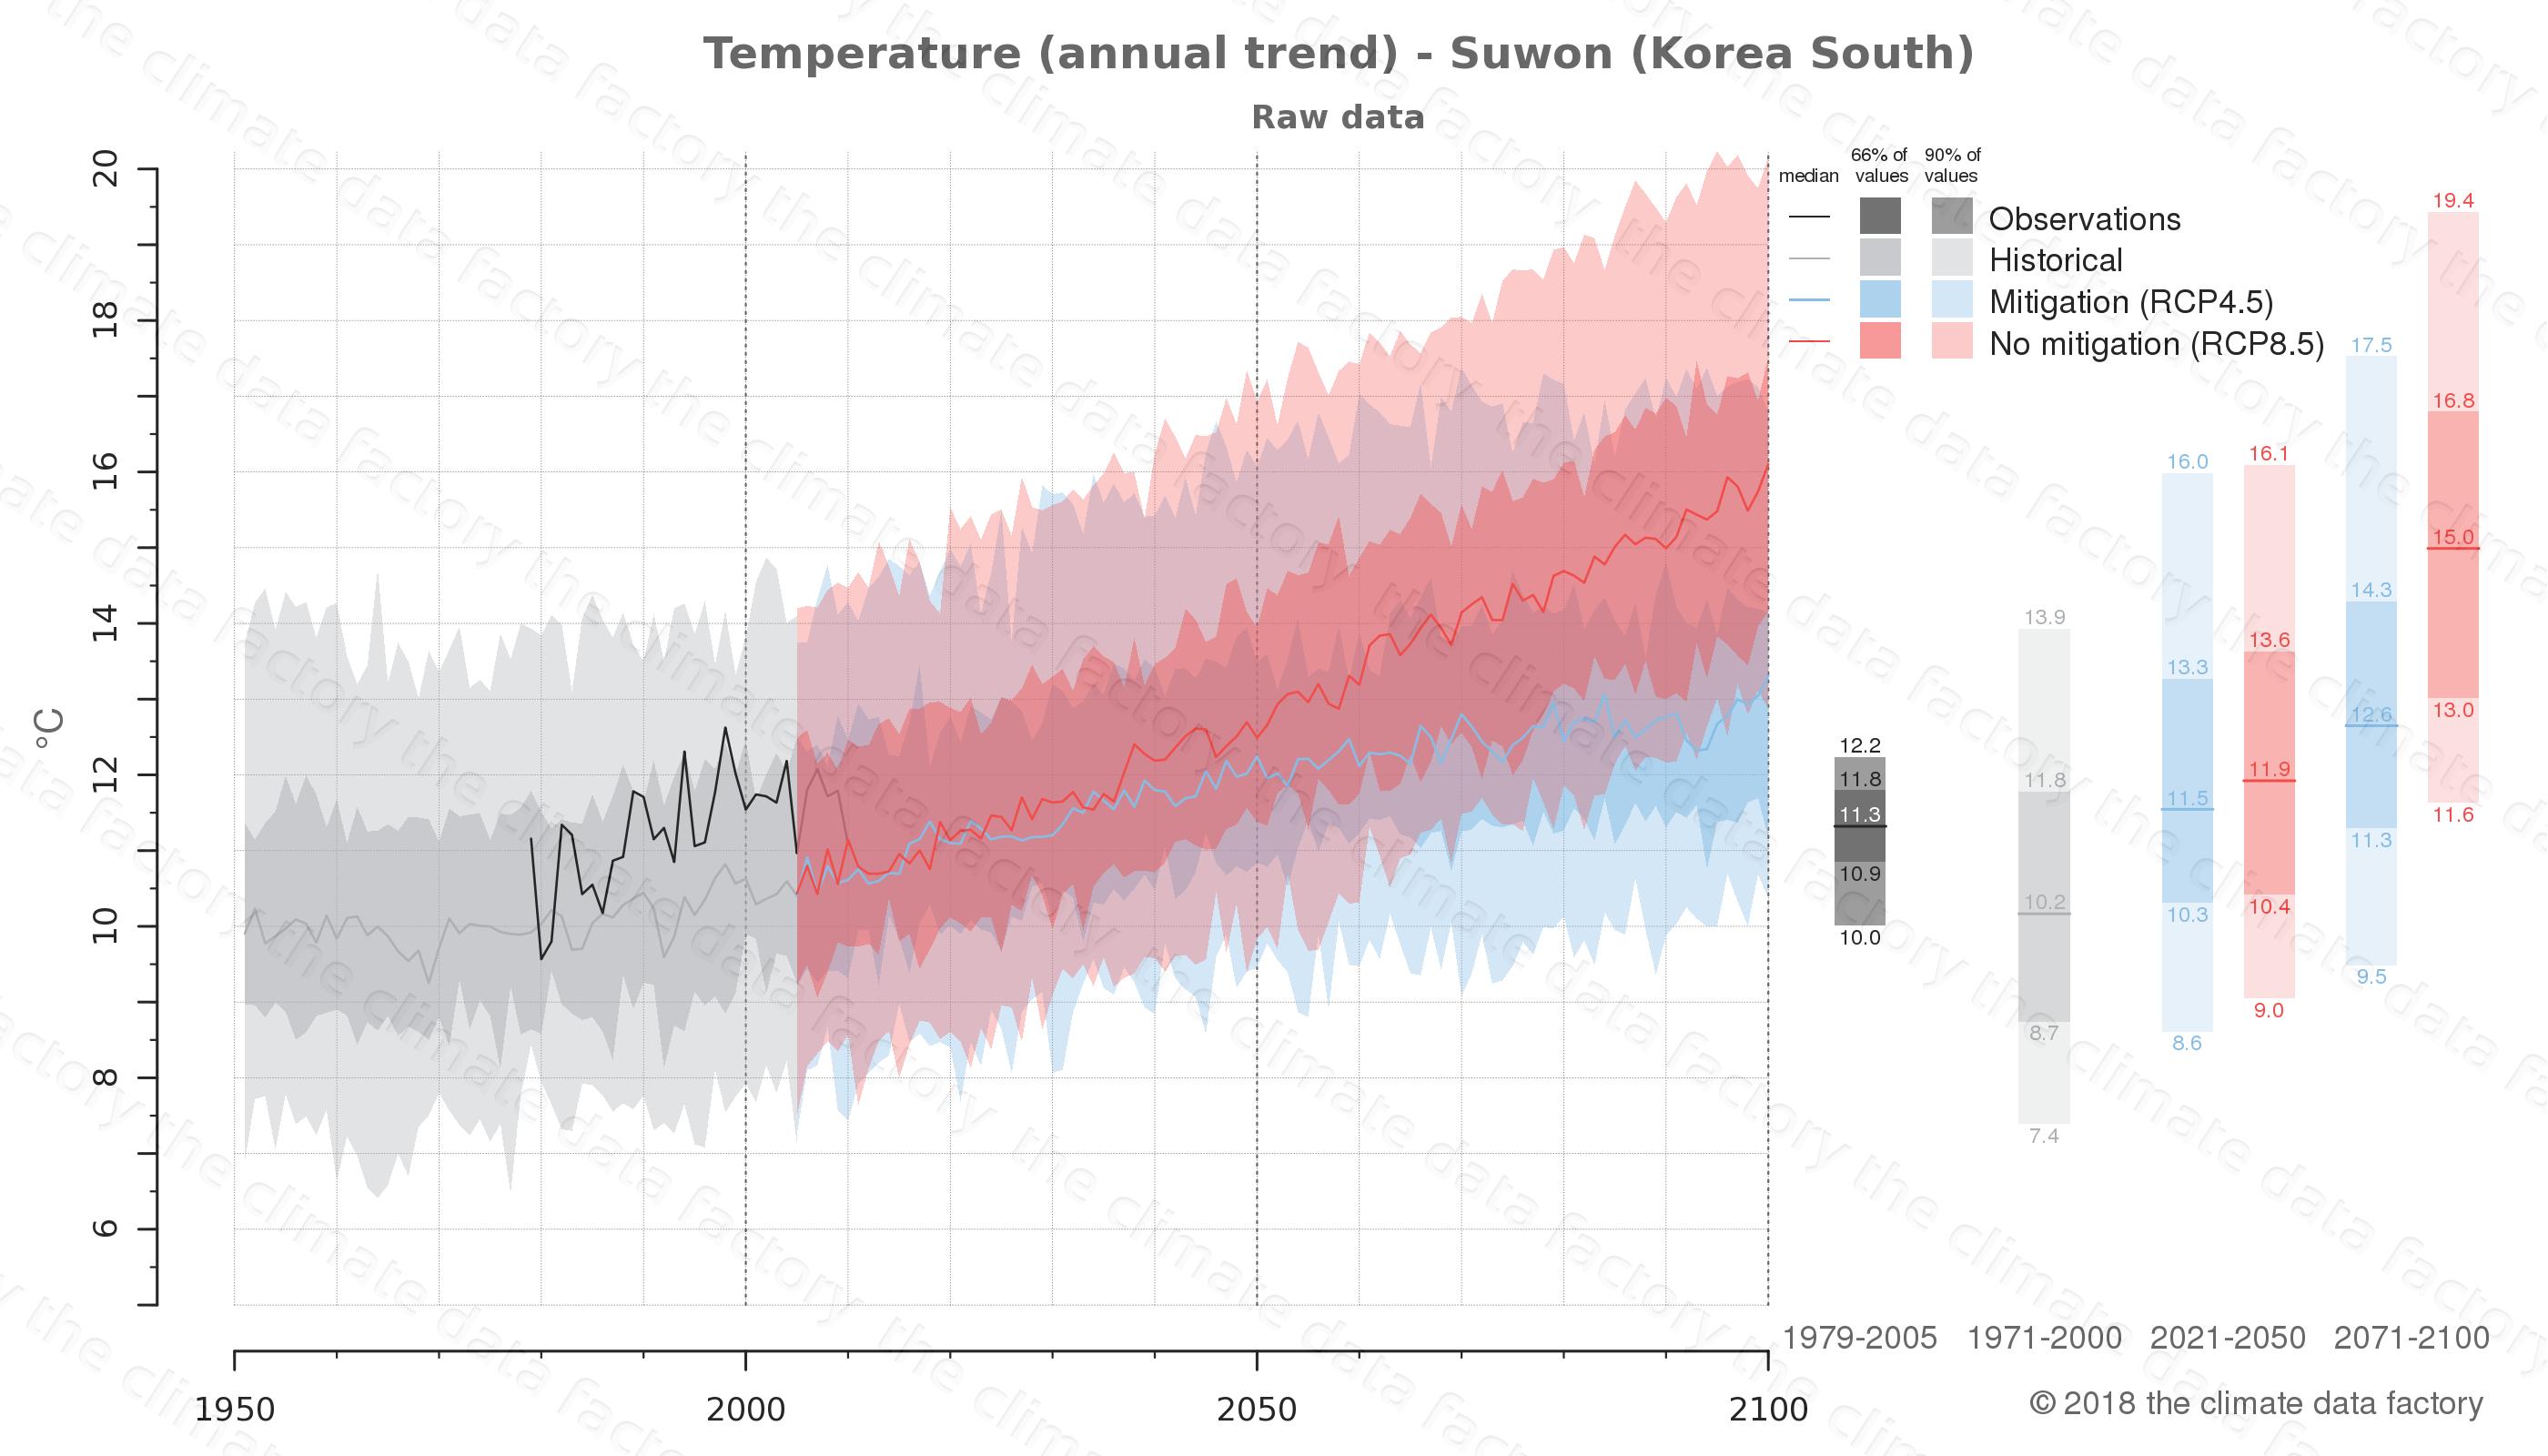 climate change data policy adaptation climate graph city data temperature suwon south korea